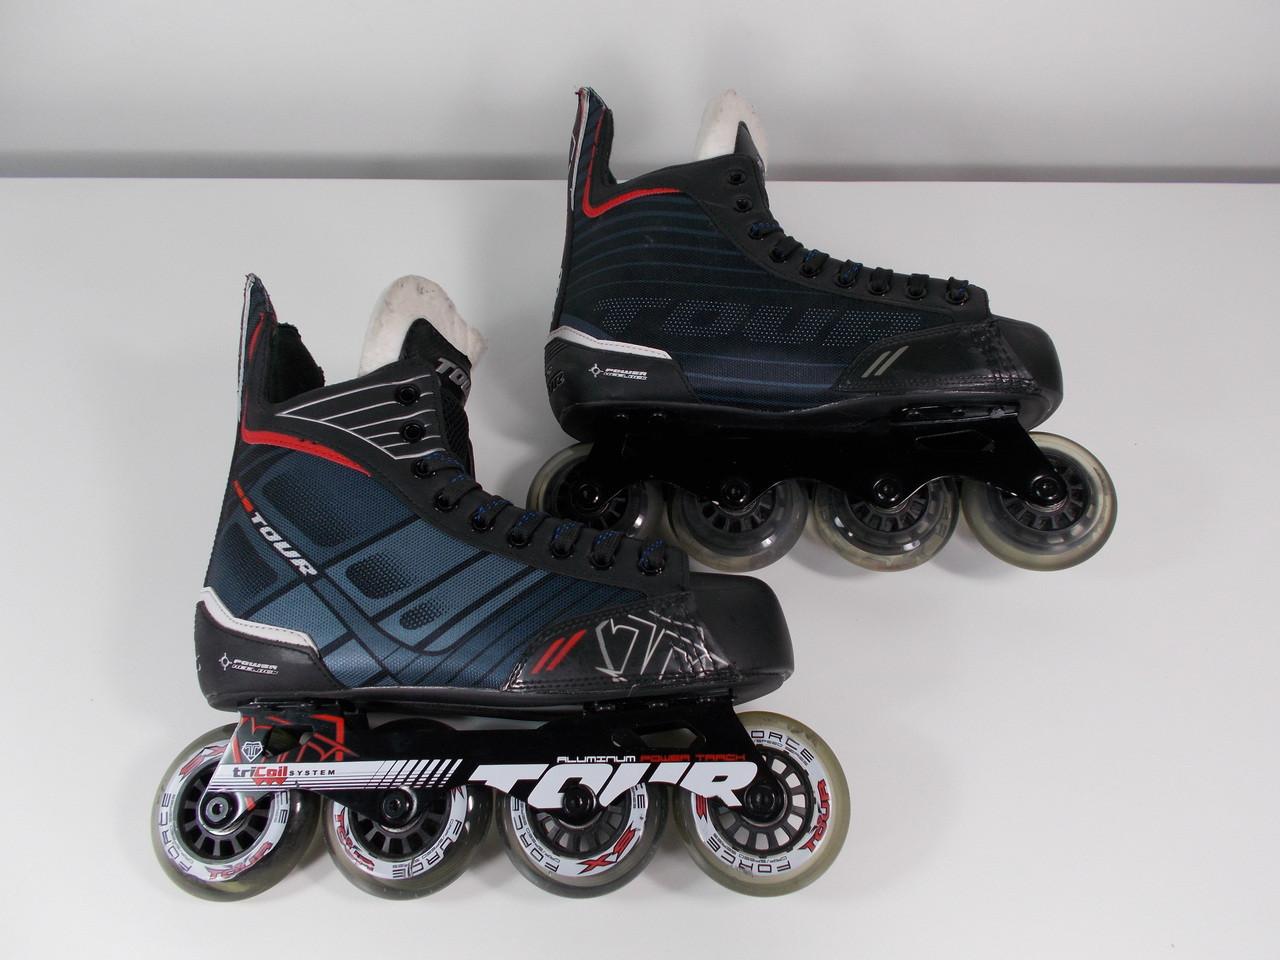 Used Hockey Skates >> Slightly Used Tour Fishbone 225 Senior Hockey Skate Size 6